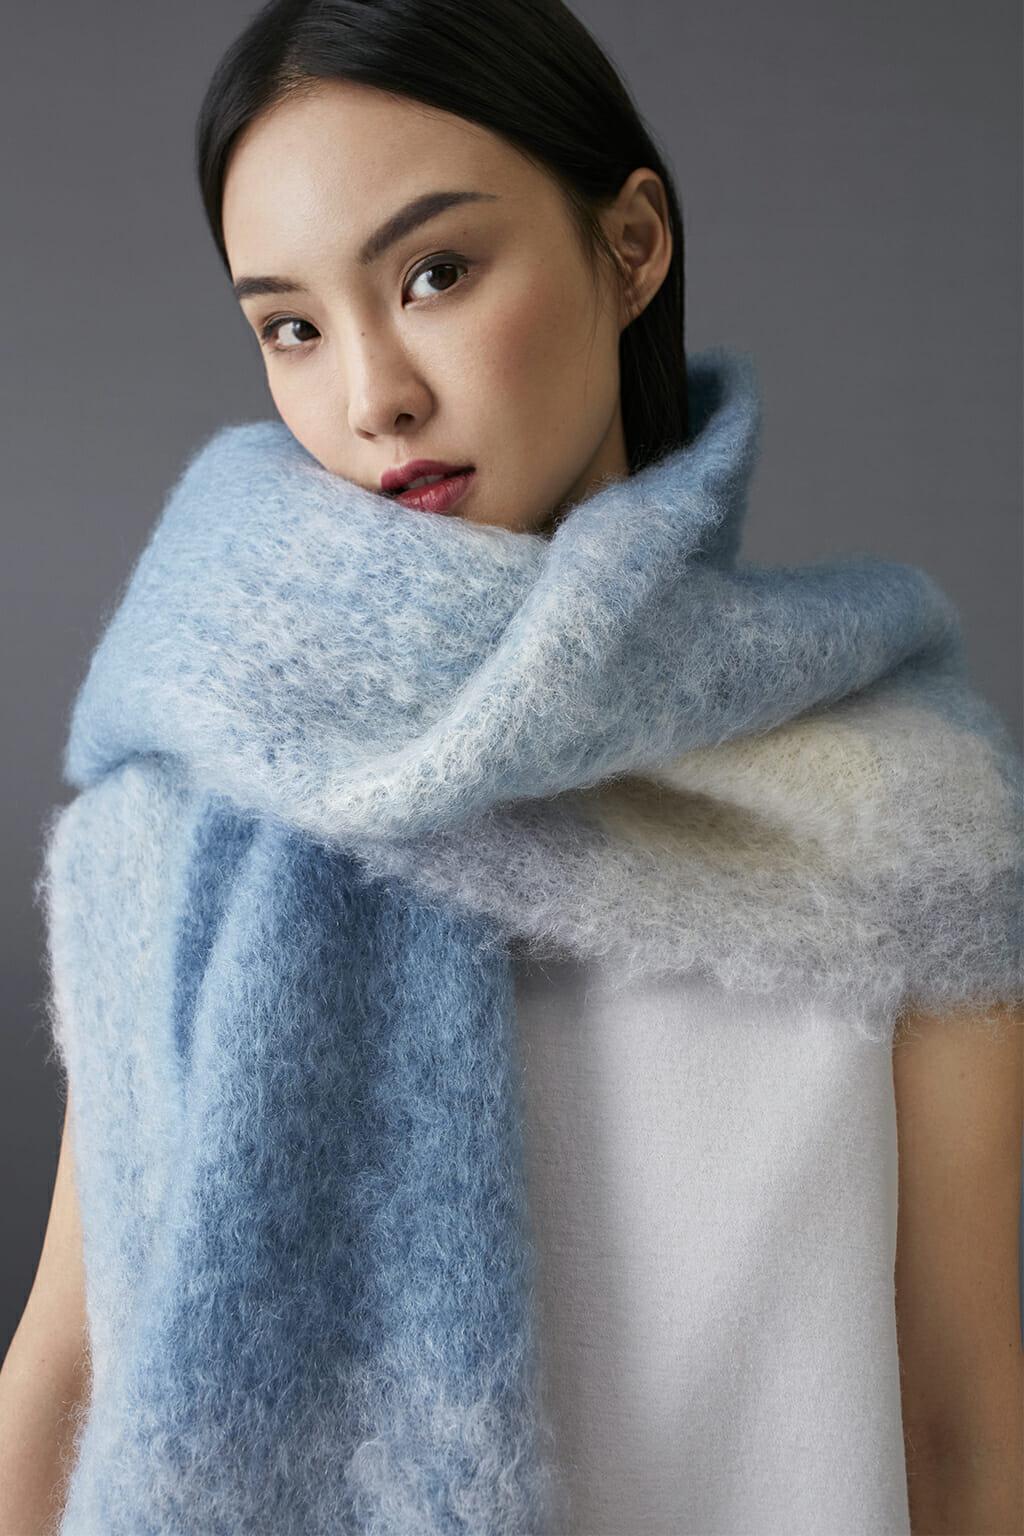 ch-carolina-herrera-fashion-fall-2018-scarf-wool-blue-white